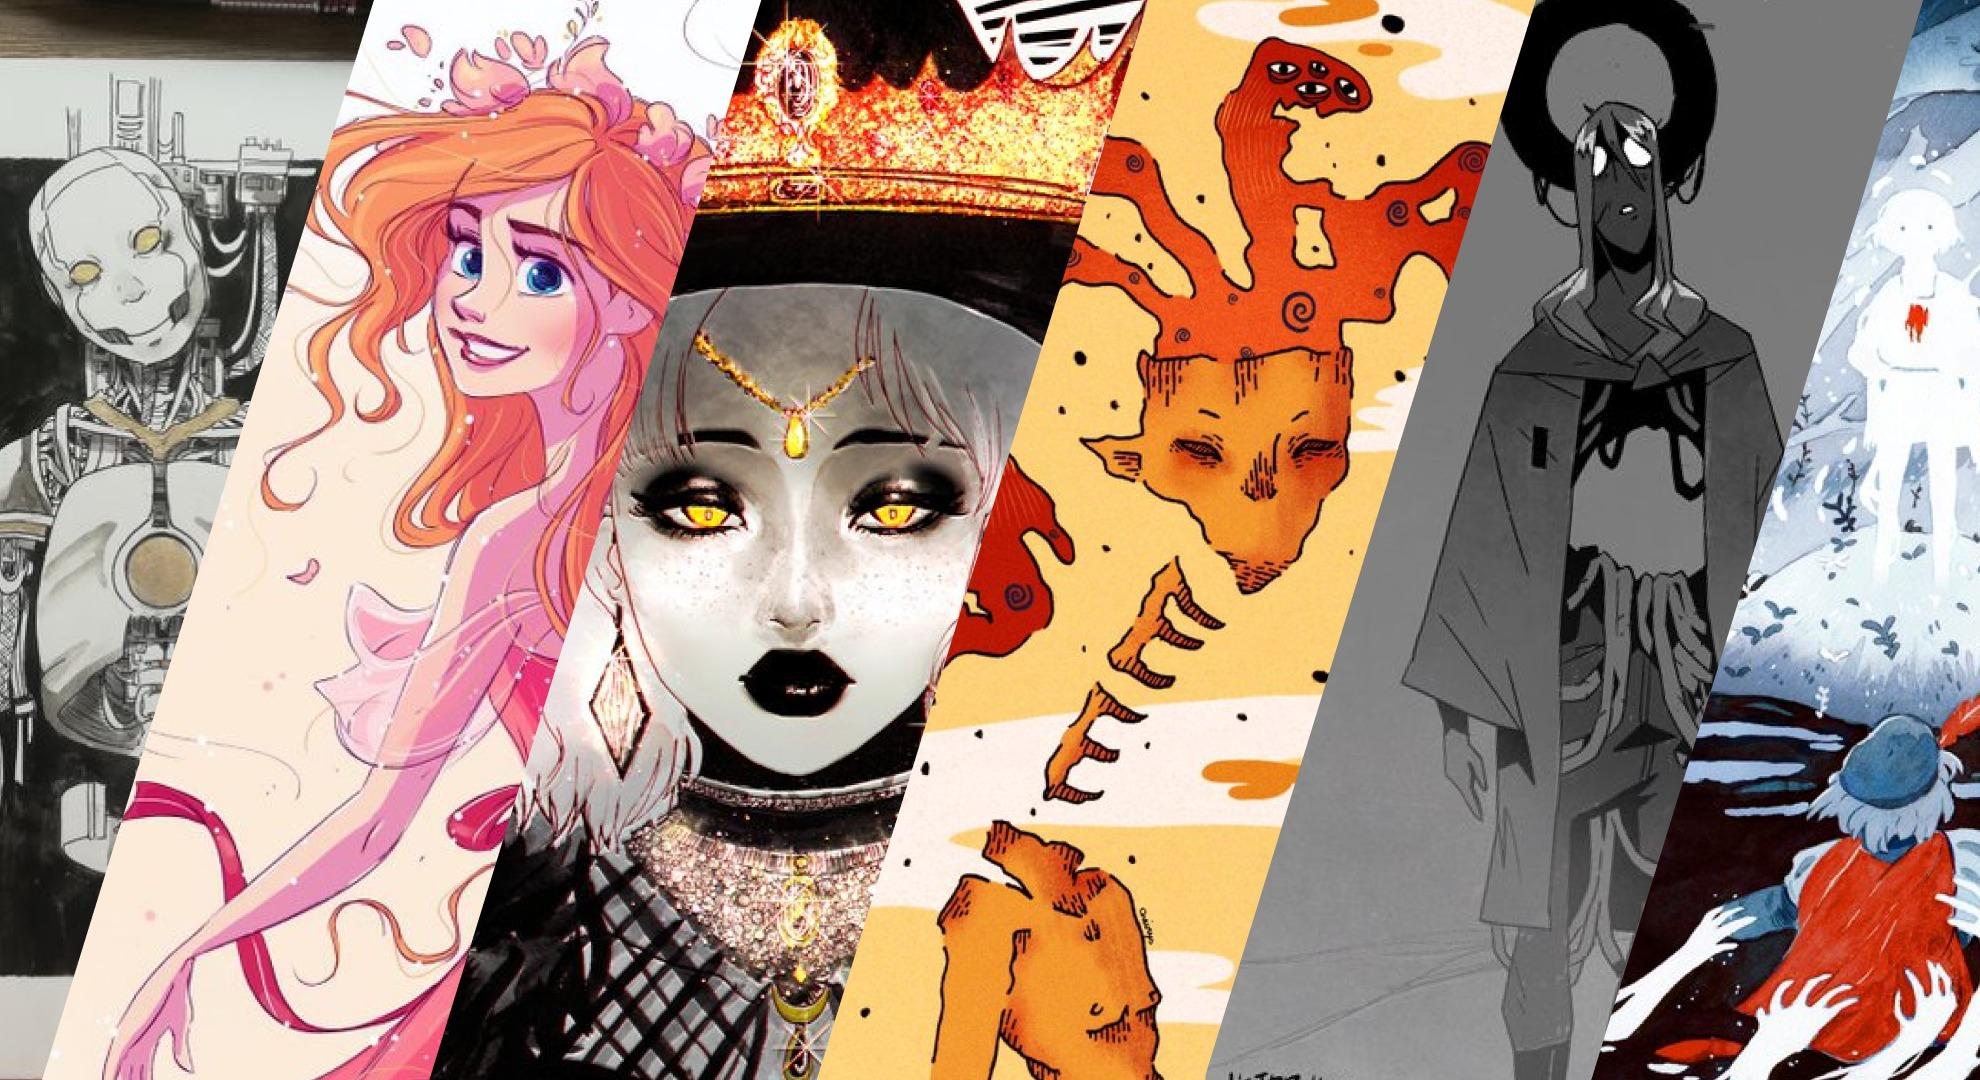 Inktober 2019 : sélection d'artistes semaine 1